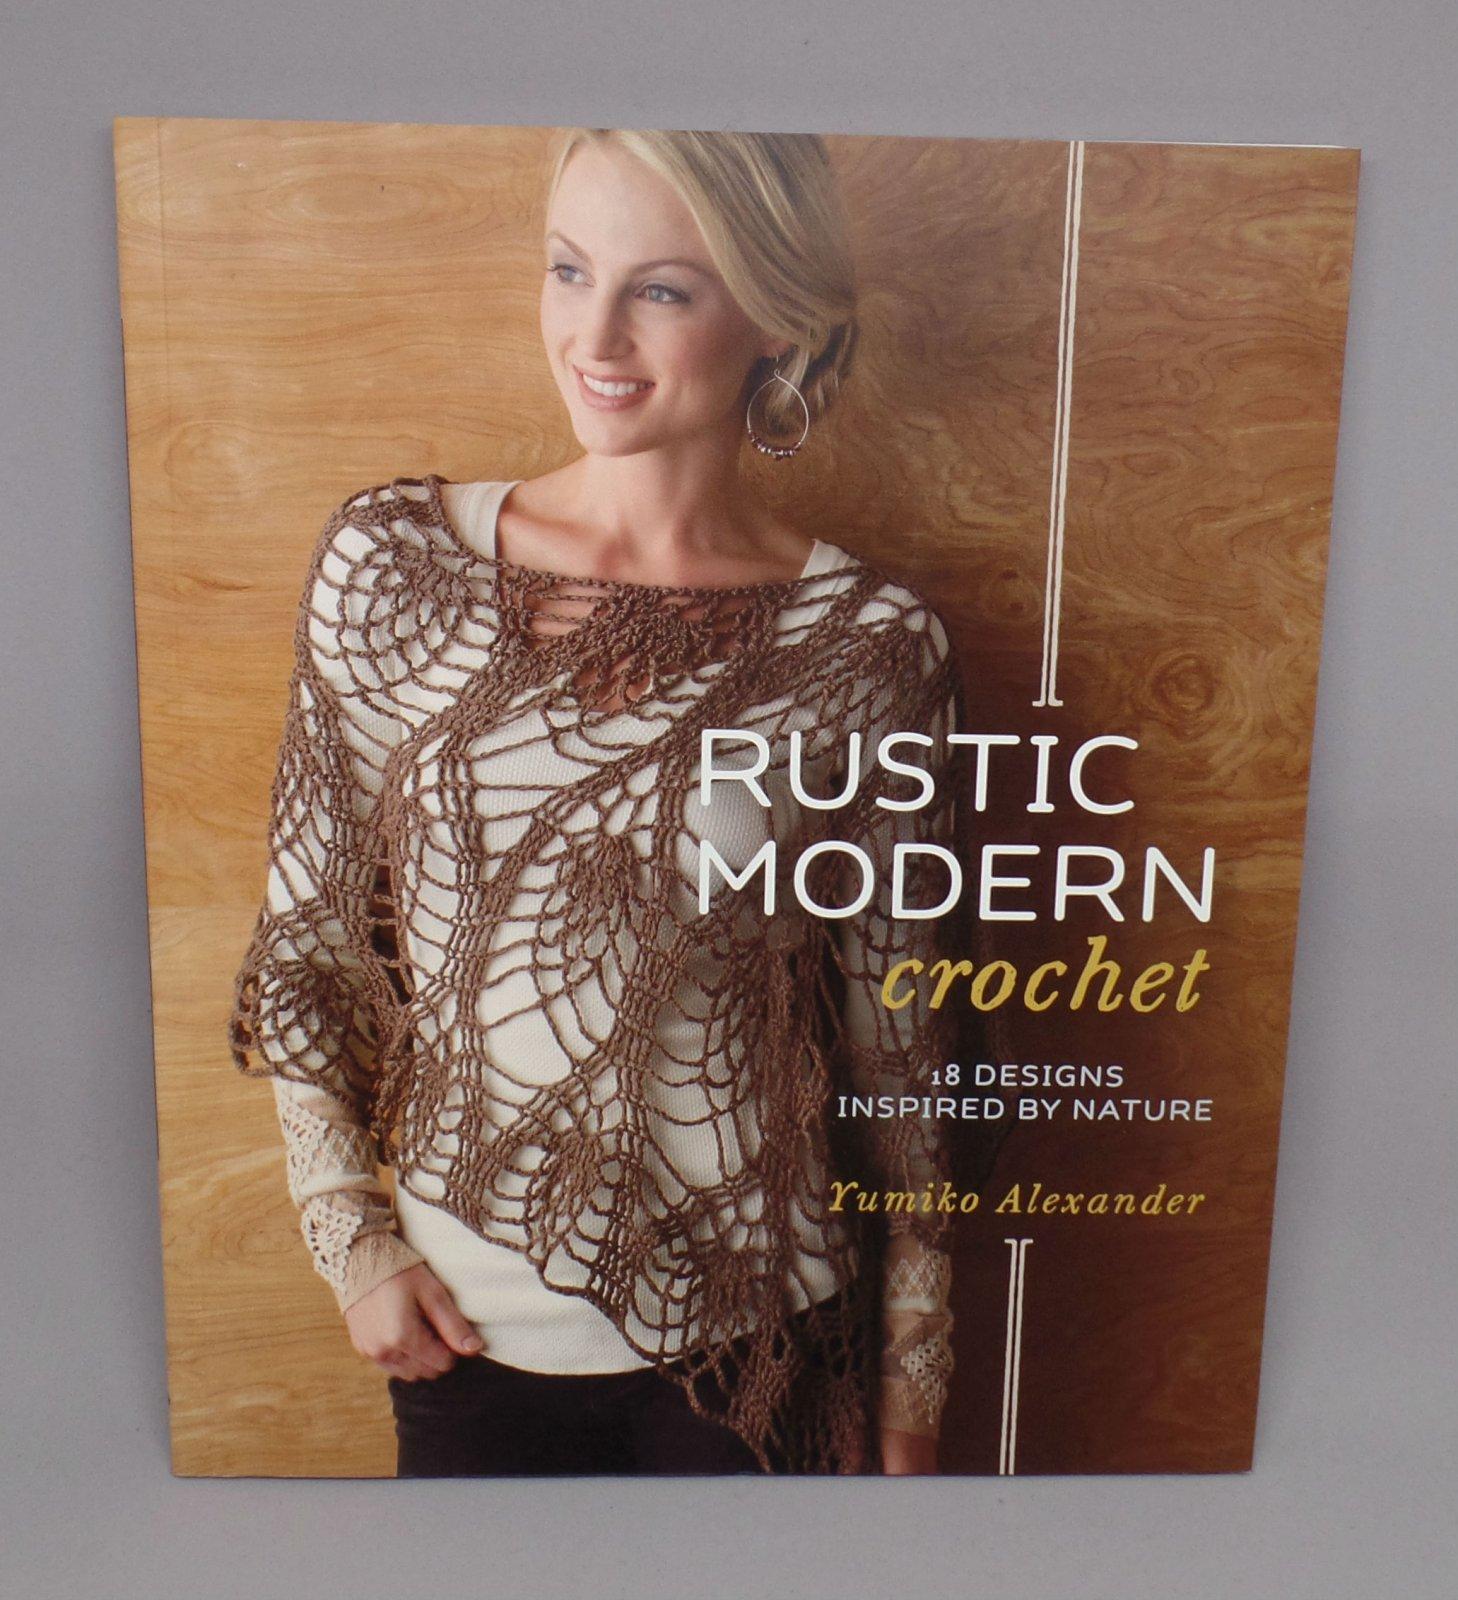 Rustic Modern Crochet